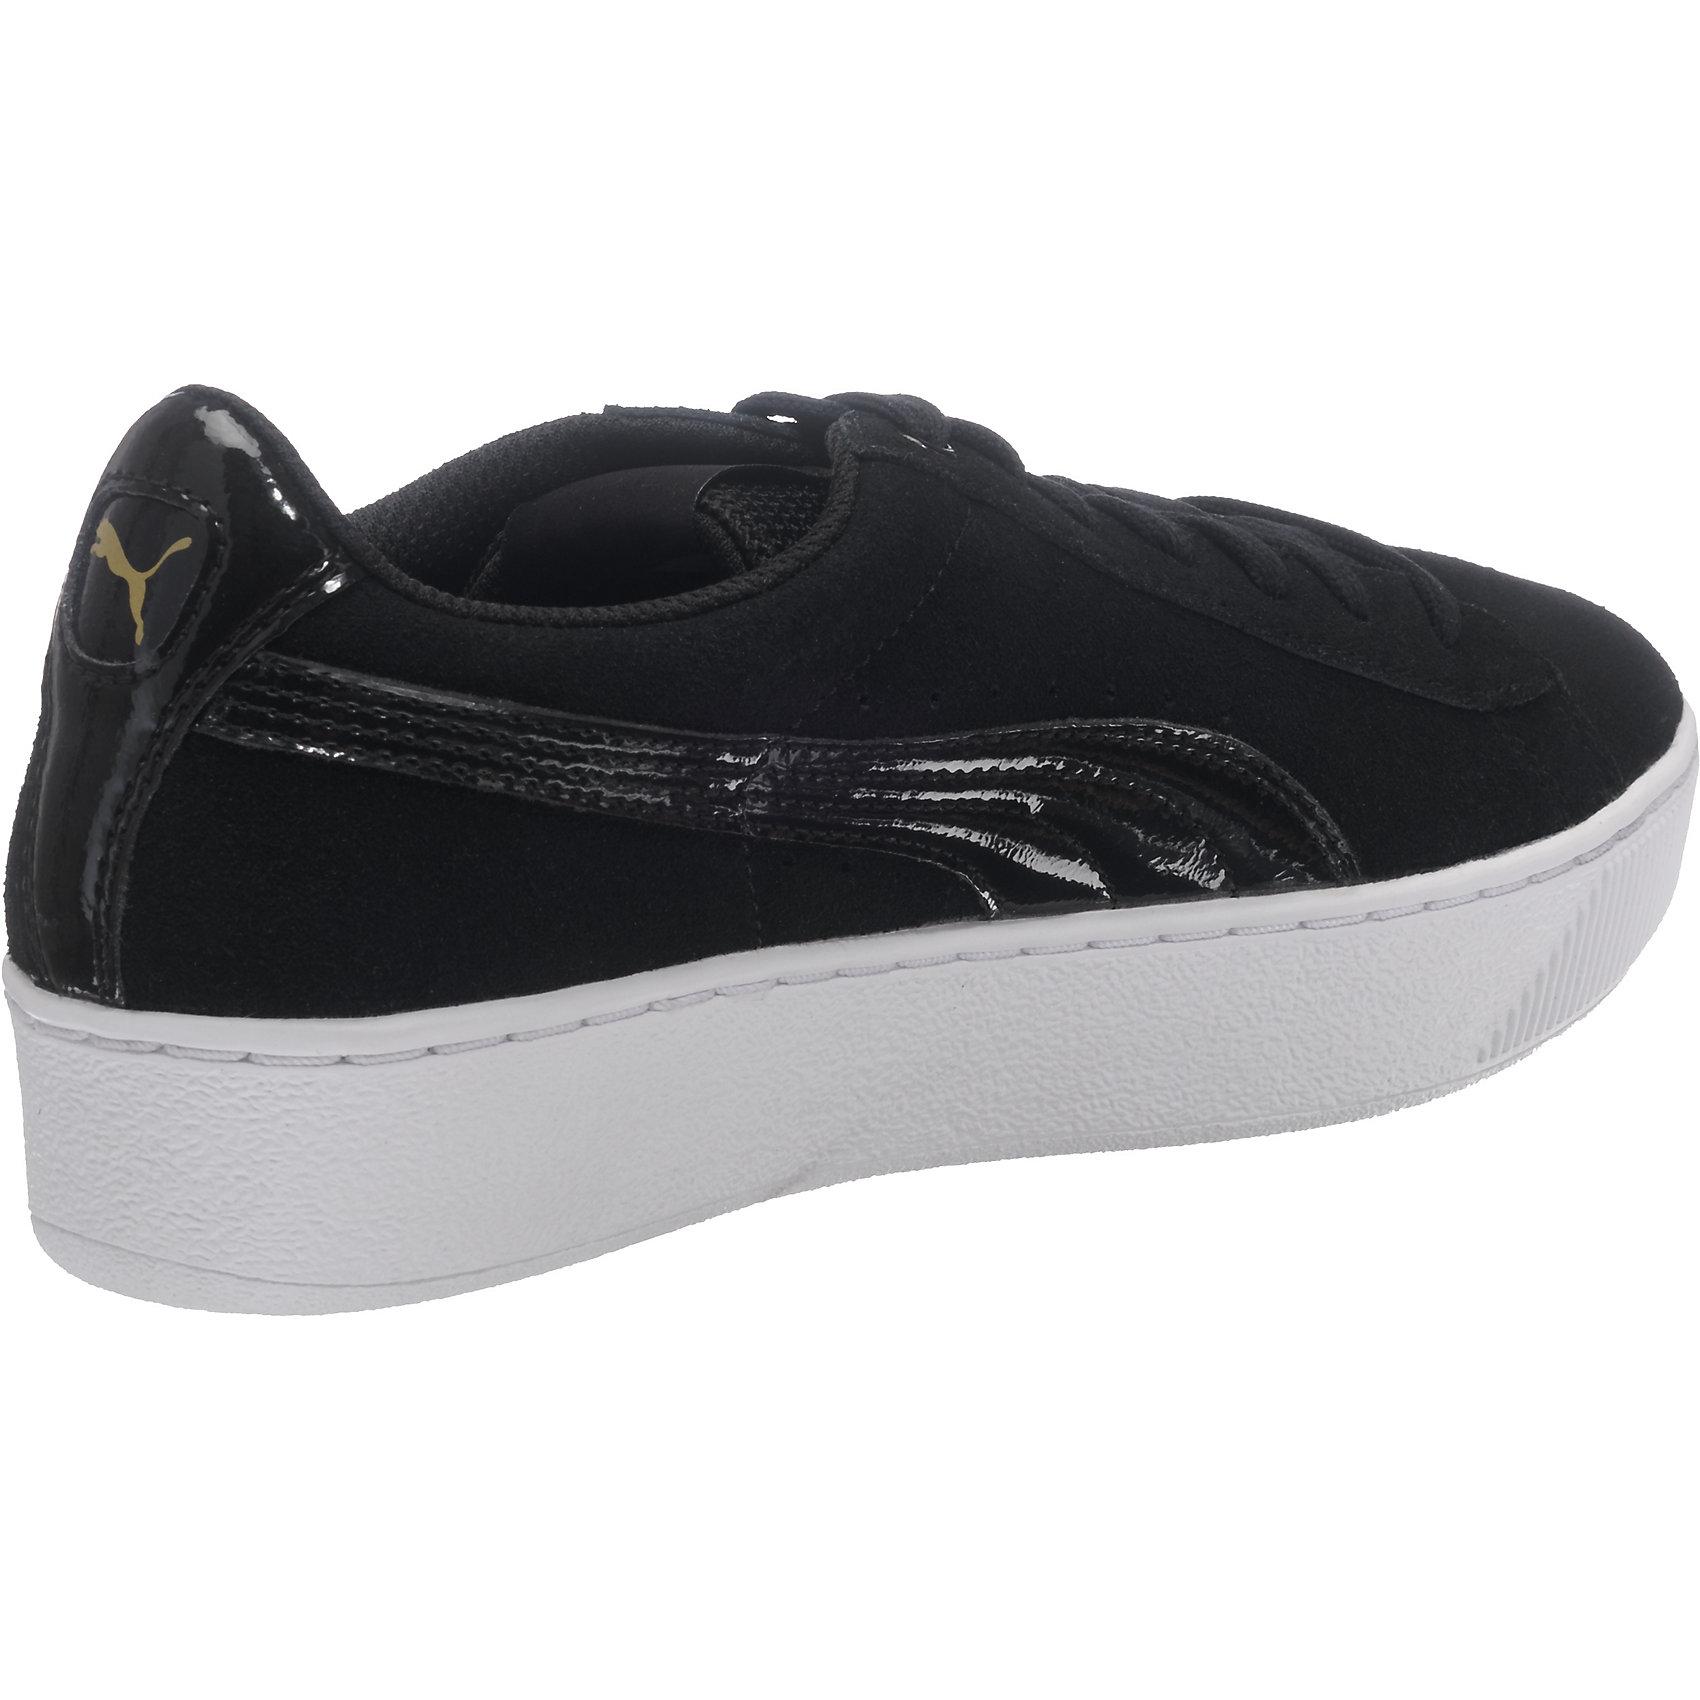 Details zu PUMA Vikky Platform Sneakers schwarz dunkelblau schwarz Modell 1 lila 5771930